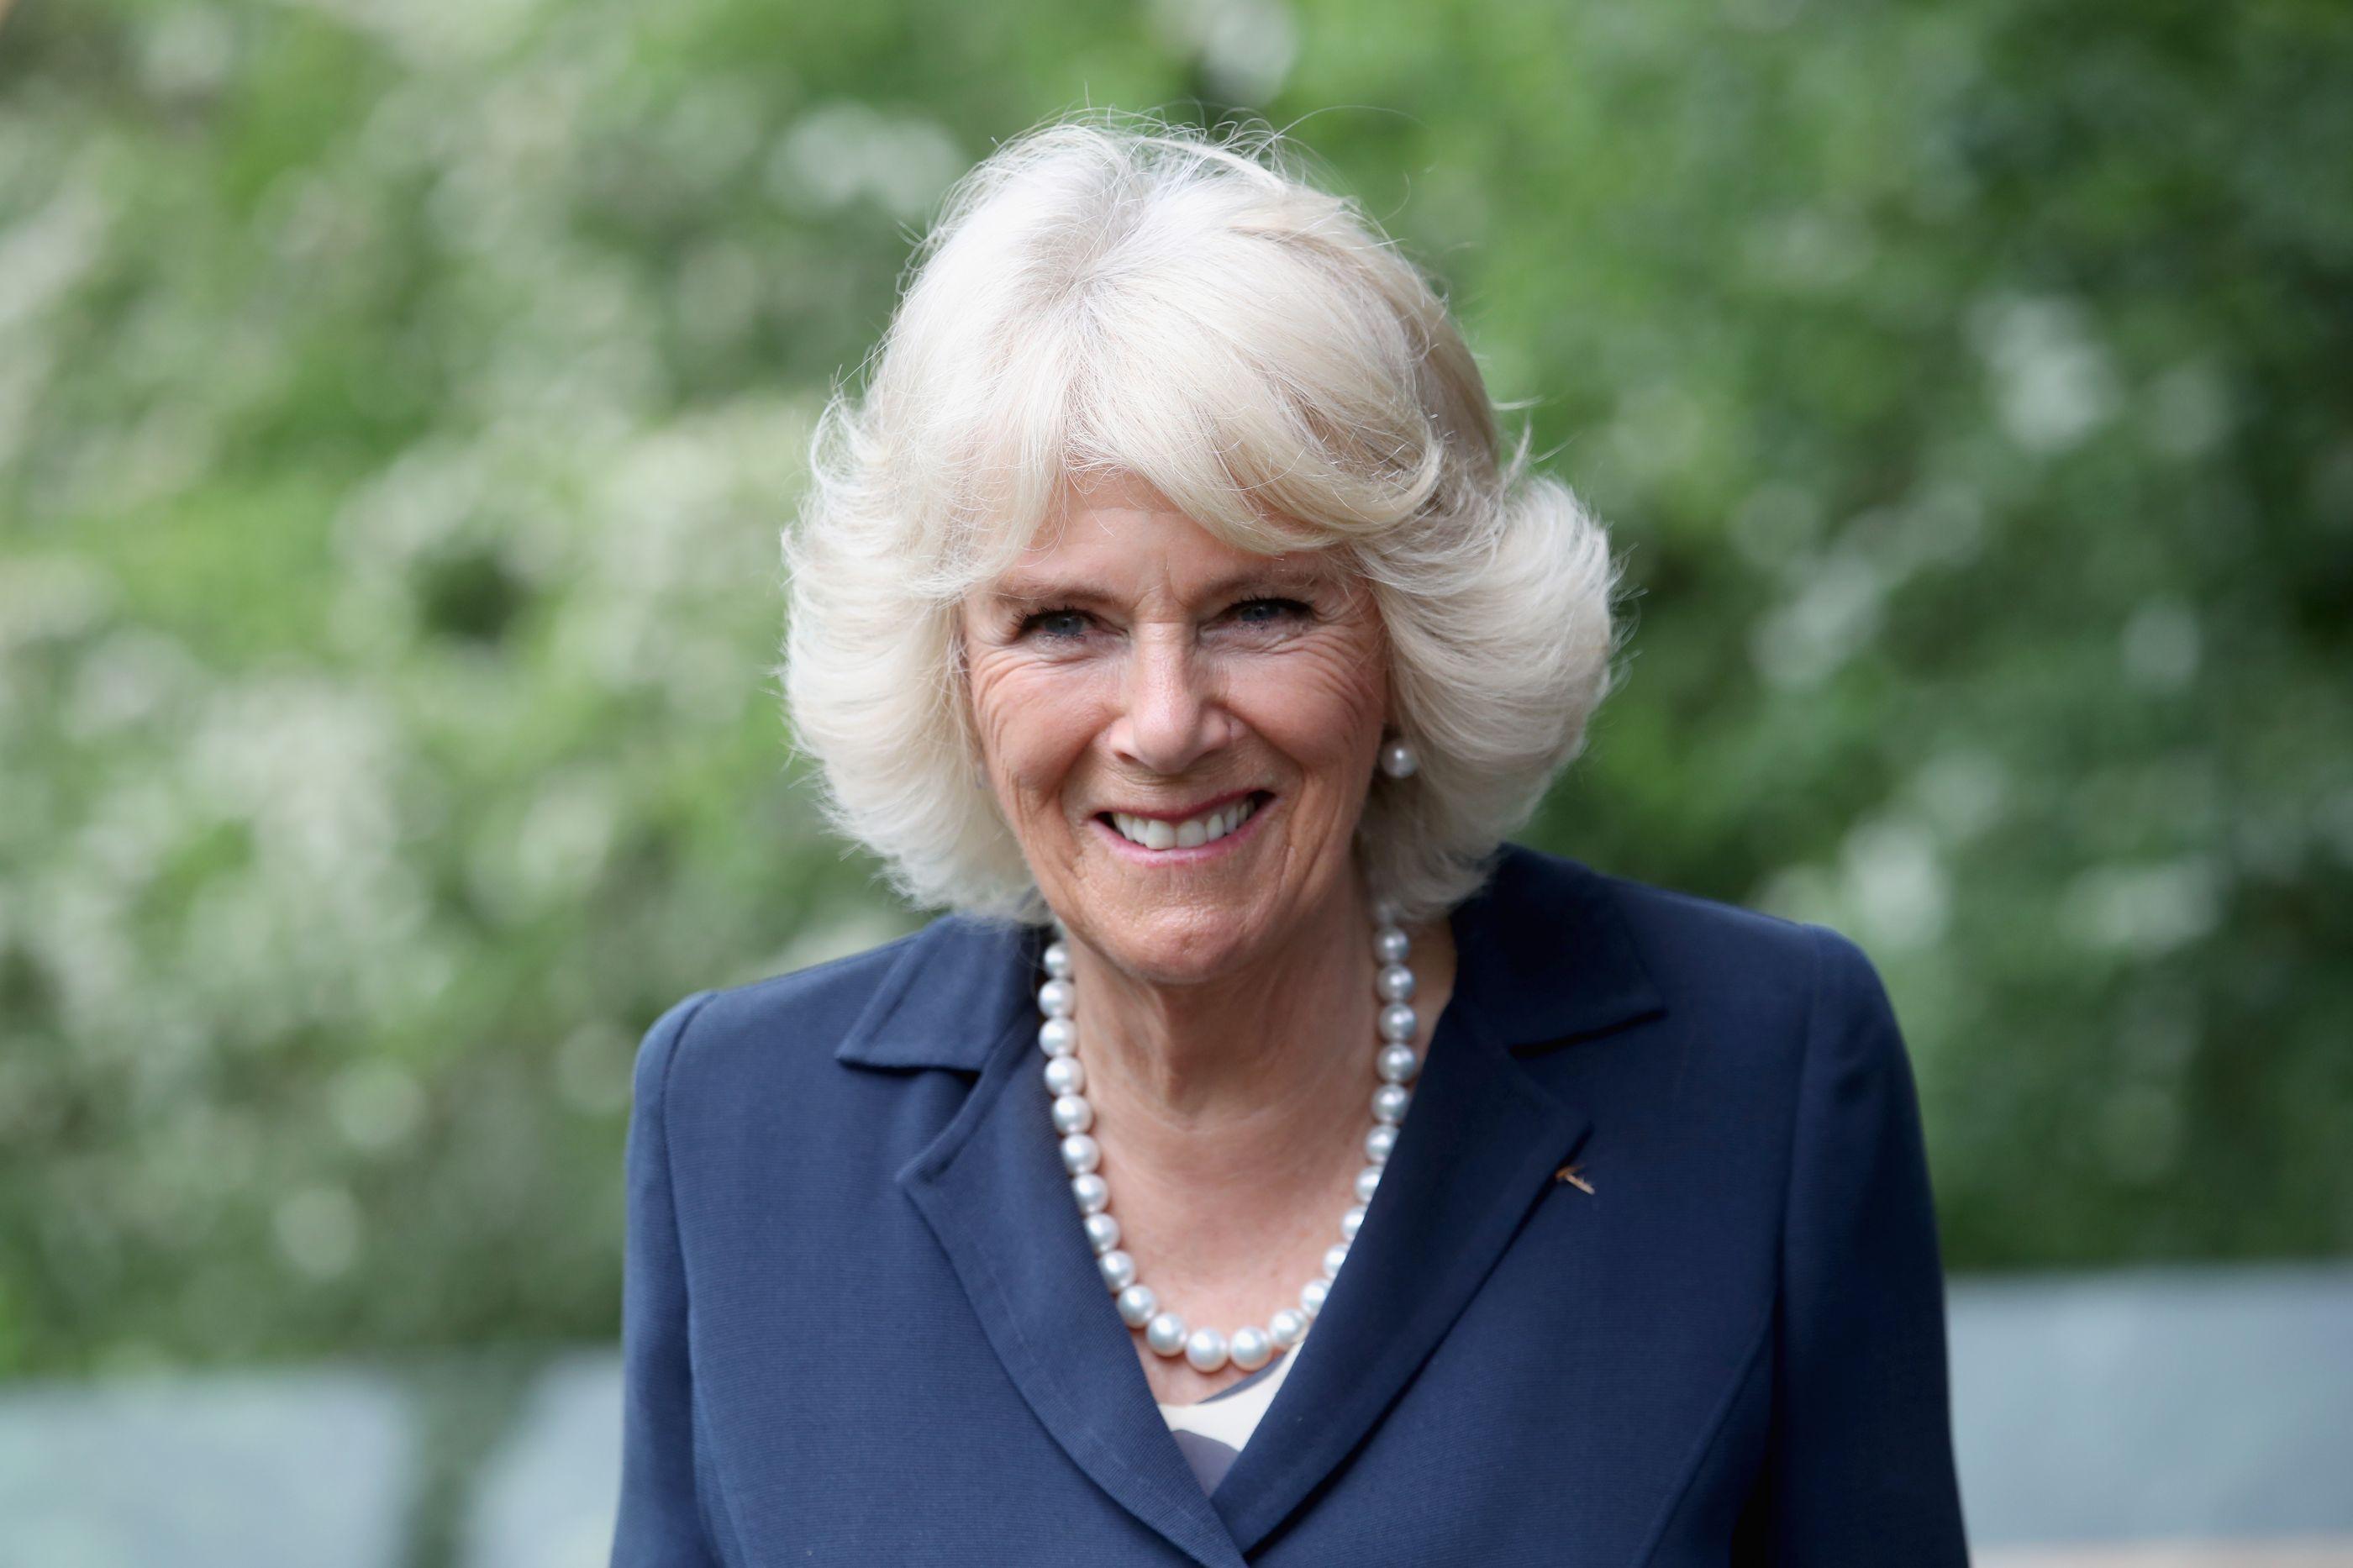 O que andava Camilla a fazer durante o casamento de Eugenie?